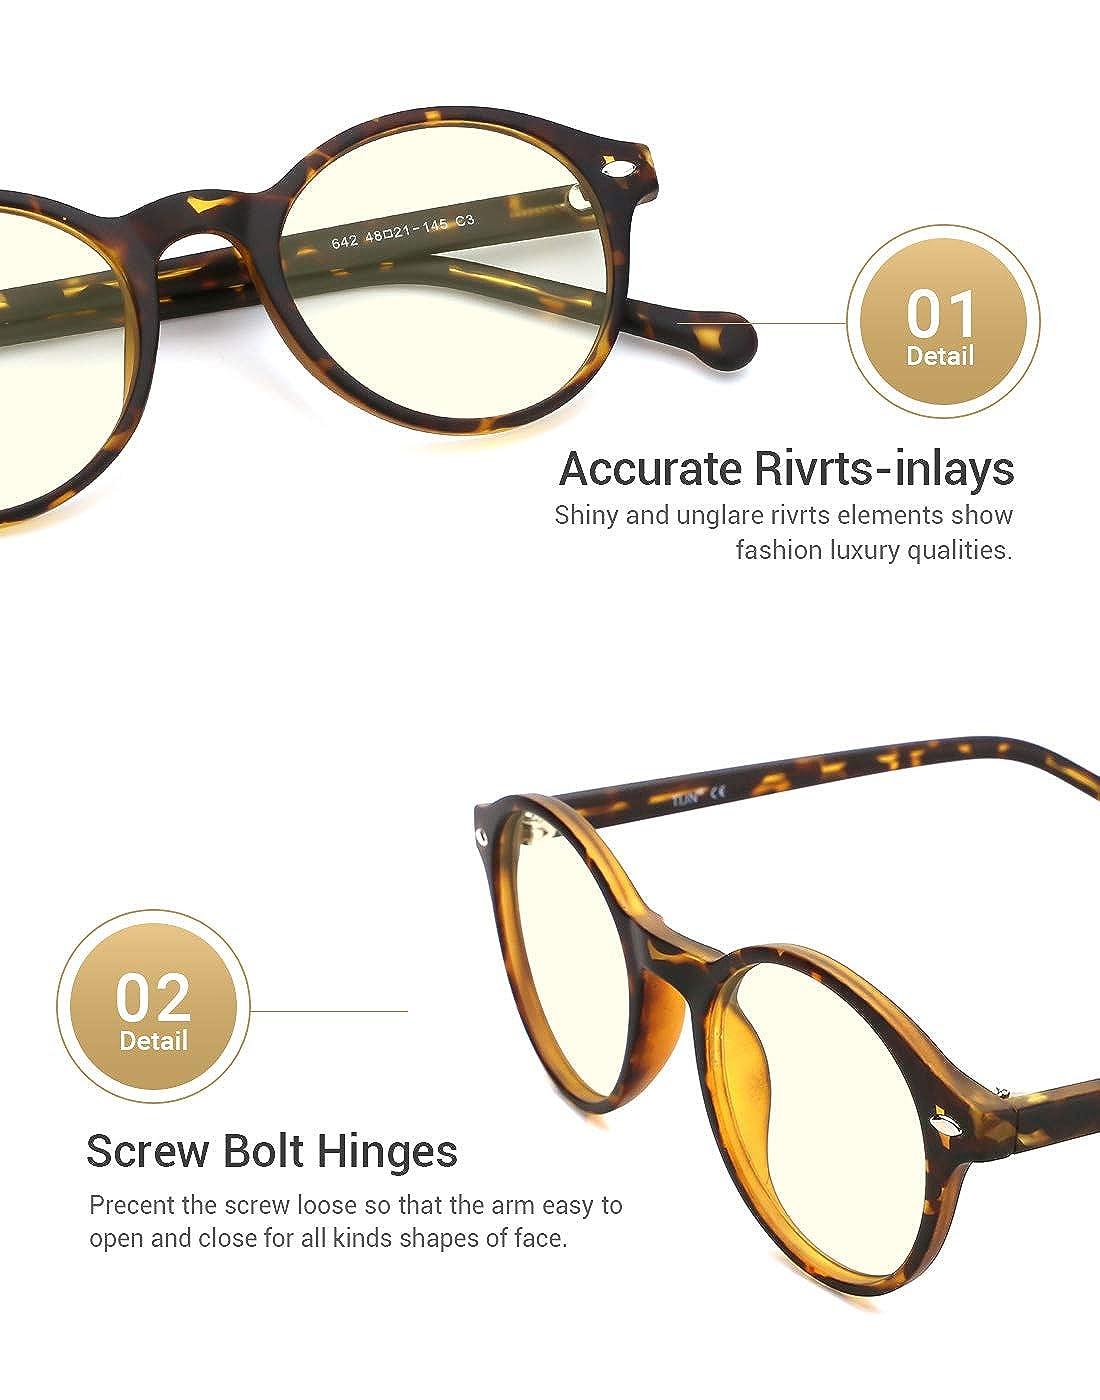 TIJN Occhiali Luce Blu Bloccanti Occhiali da vista Occhiali rotondi montatura anti luce blu per donne e uomini